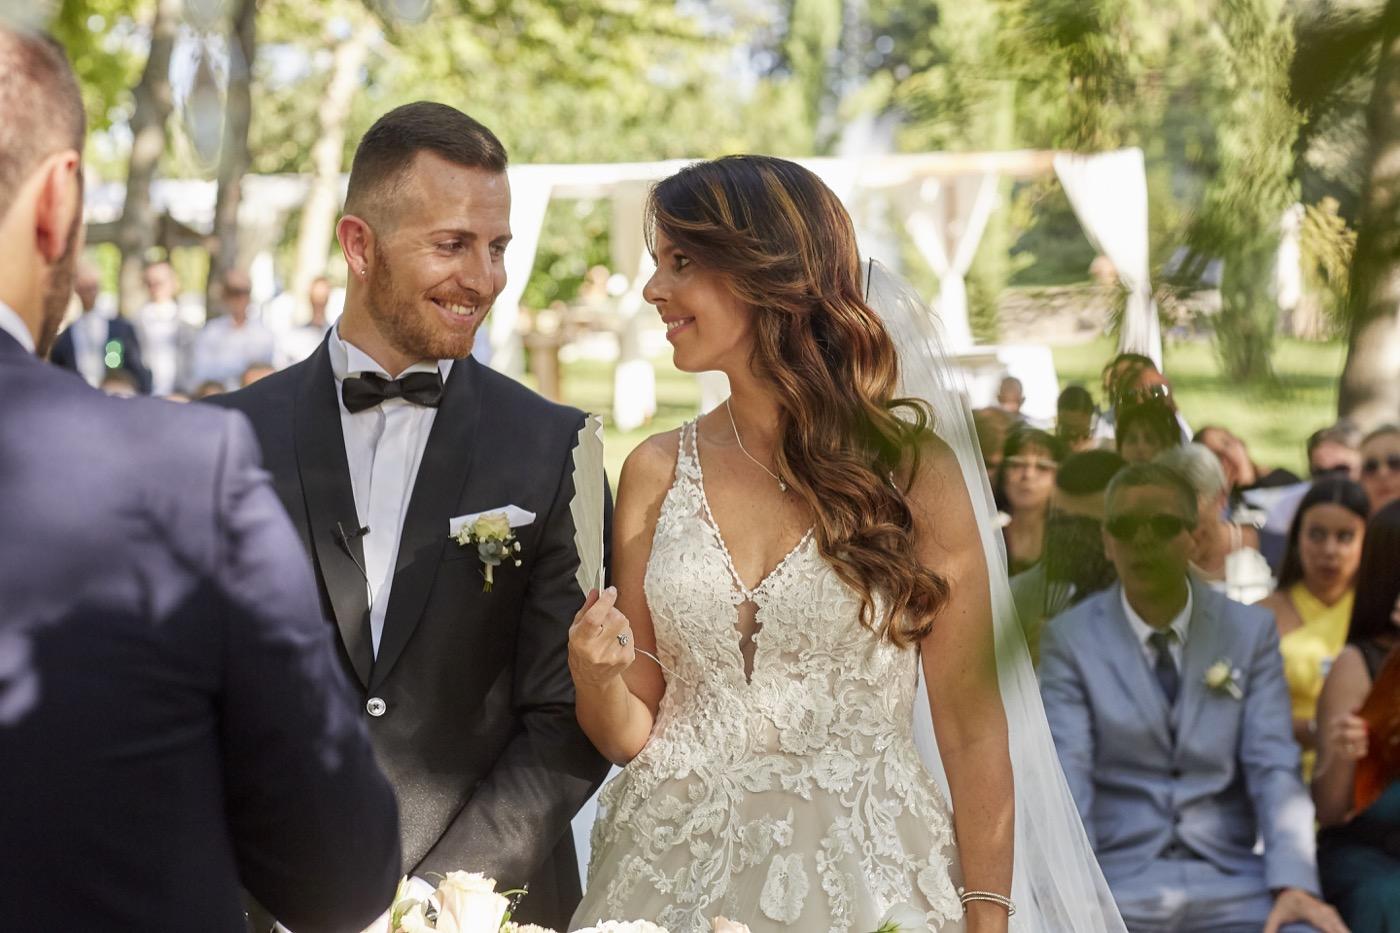 Claudio-Coppola-wedding-photographer-la-scuderia-eventi-preparativi-la-rosetta-perugia-54